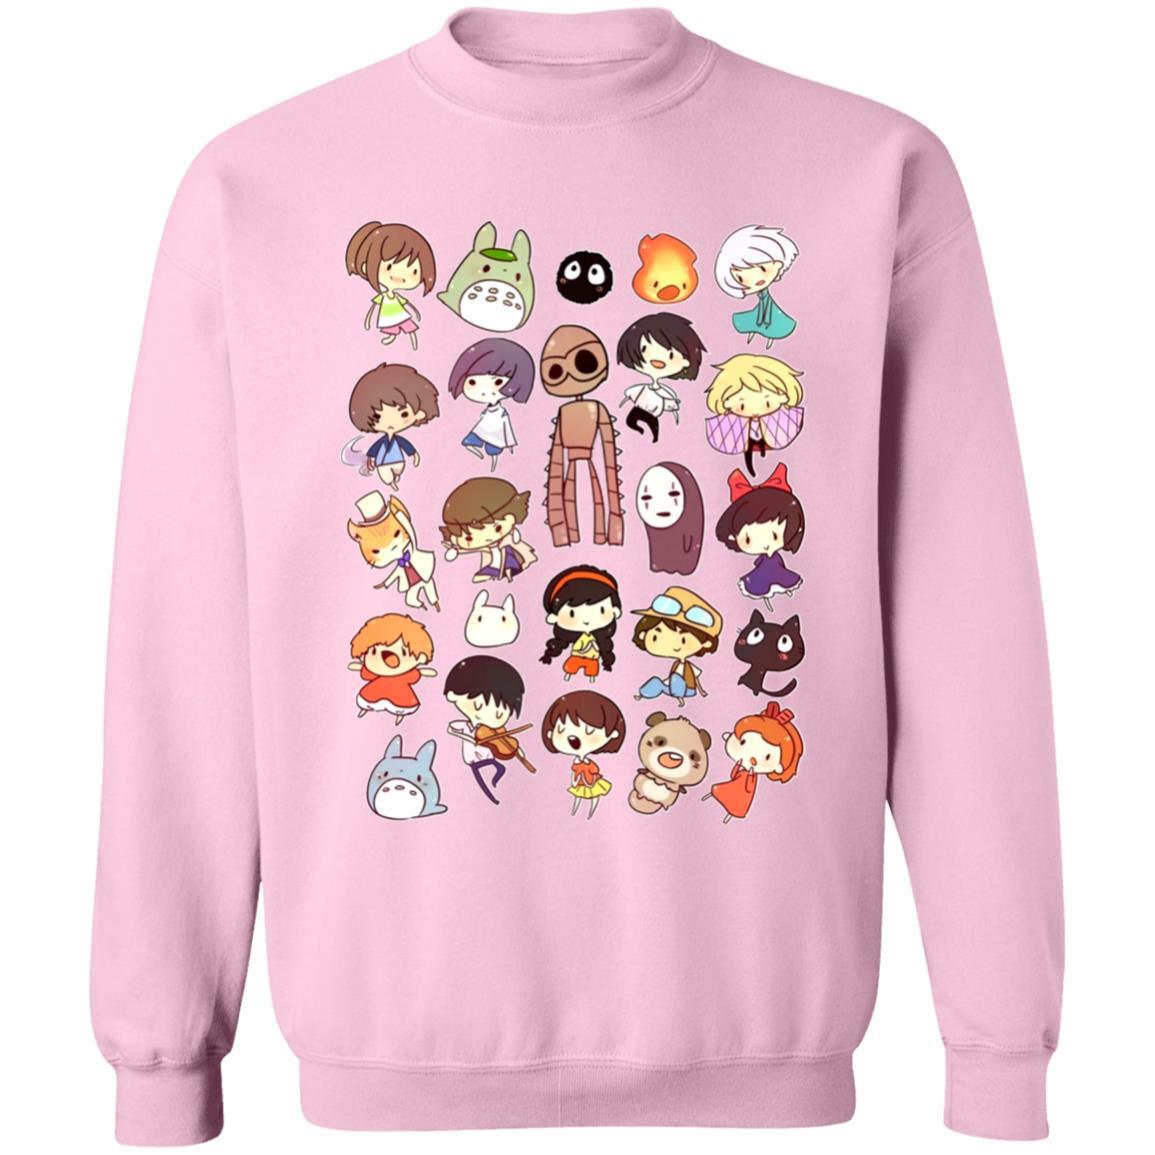 Ghibli Movie Characters Cute Chibi Collection Sweatshirt